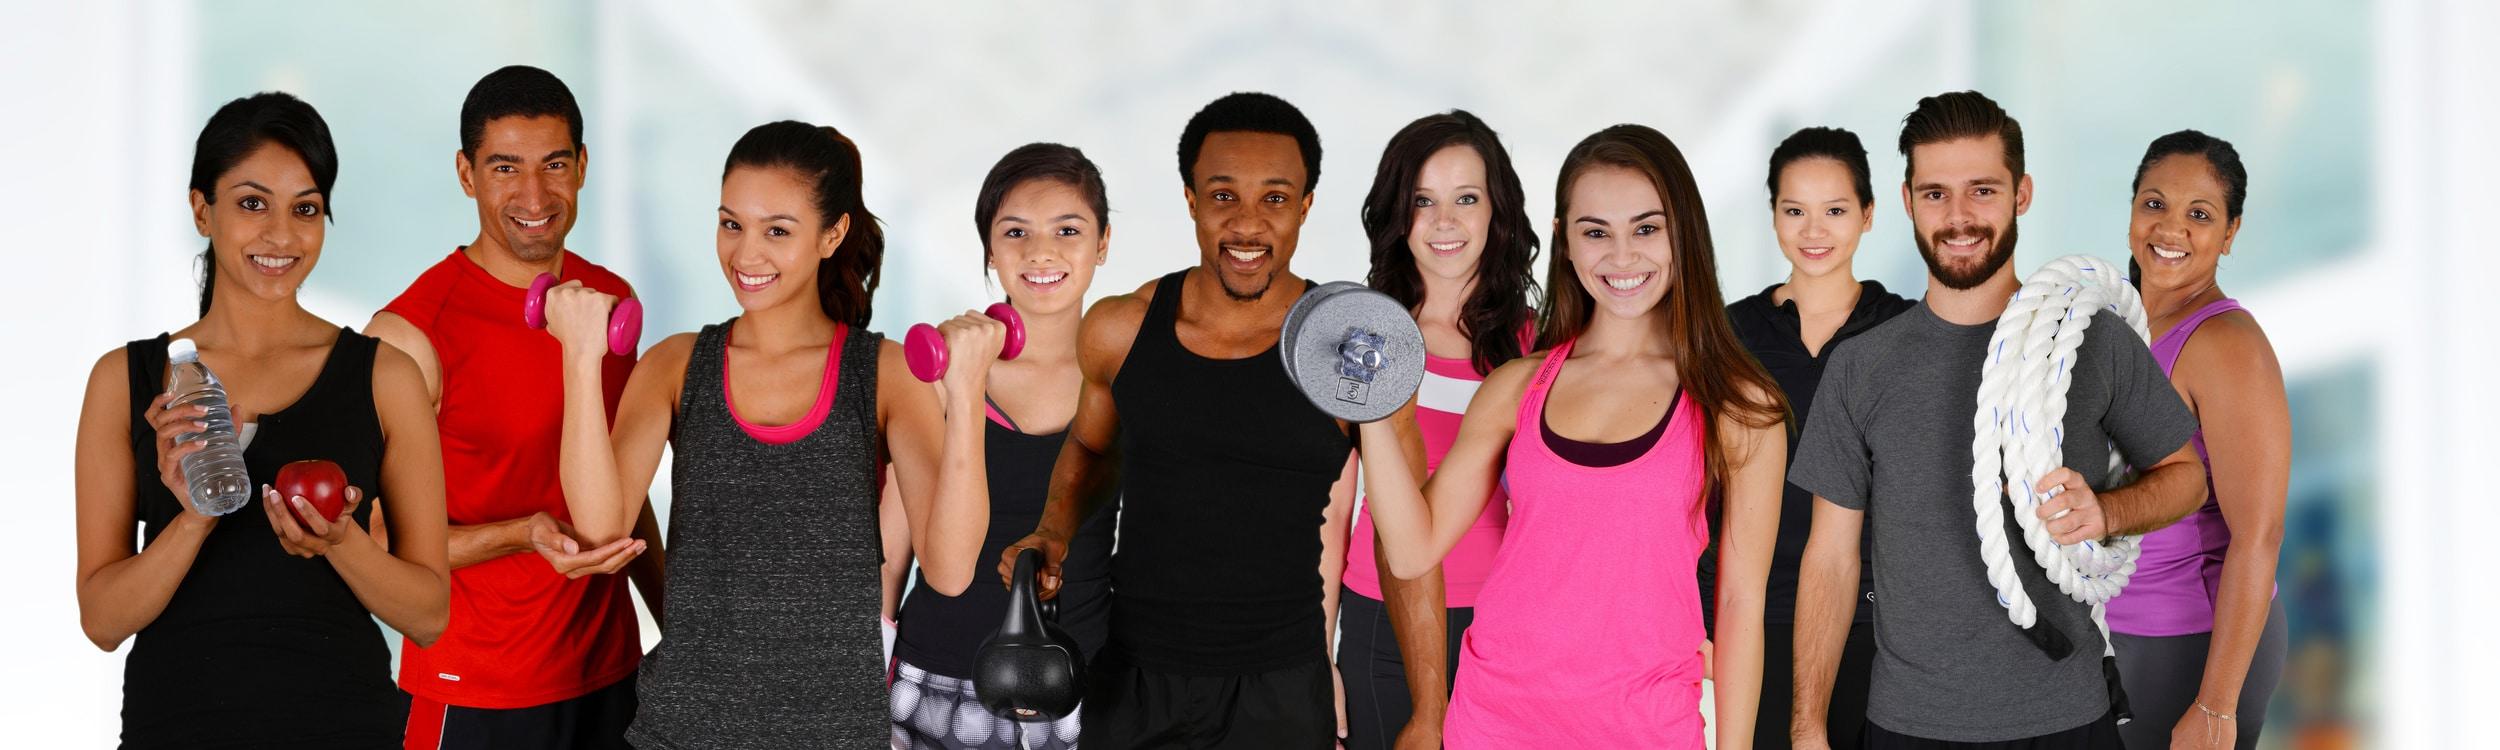 fitness groups in minneapolis